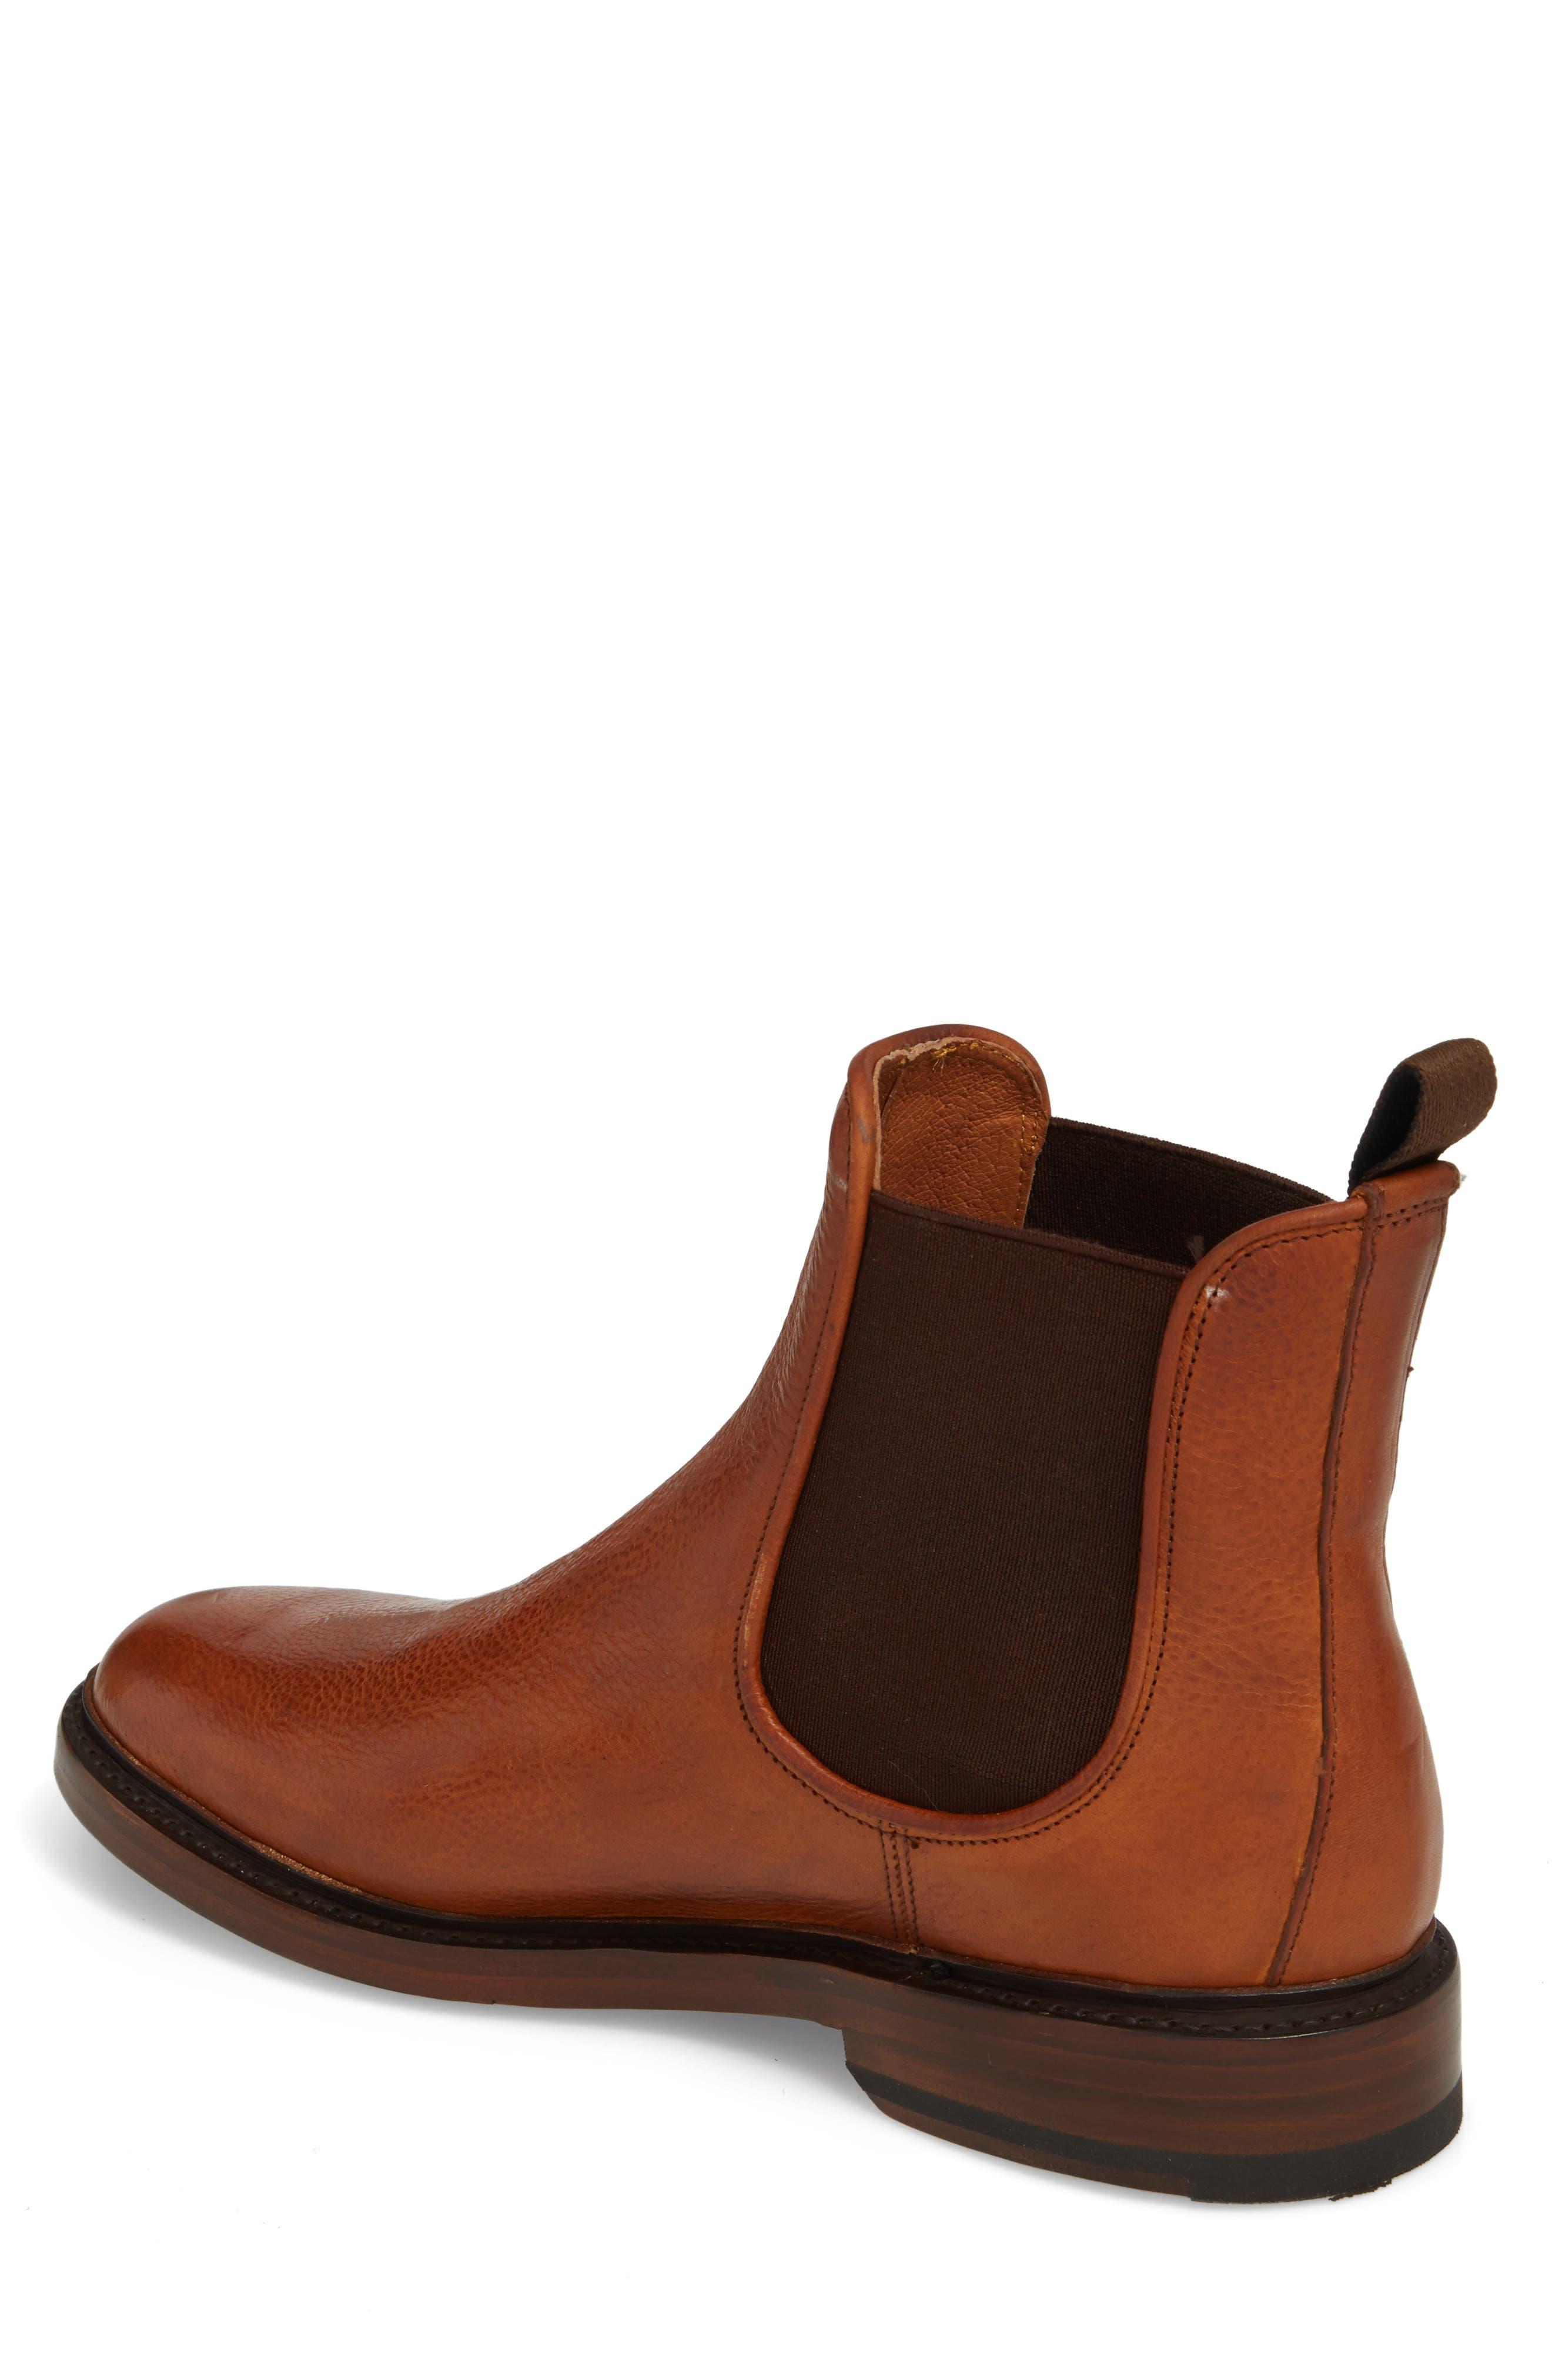 Jones Chelsea Boot,                             Alternate thumbnail 2, color,                             Caramel Leather